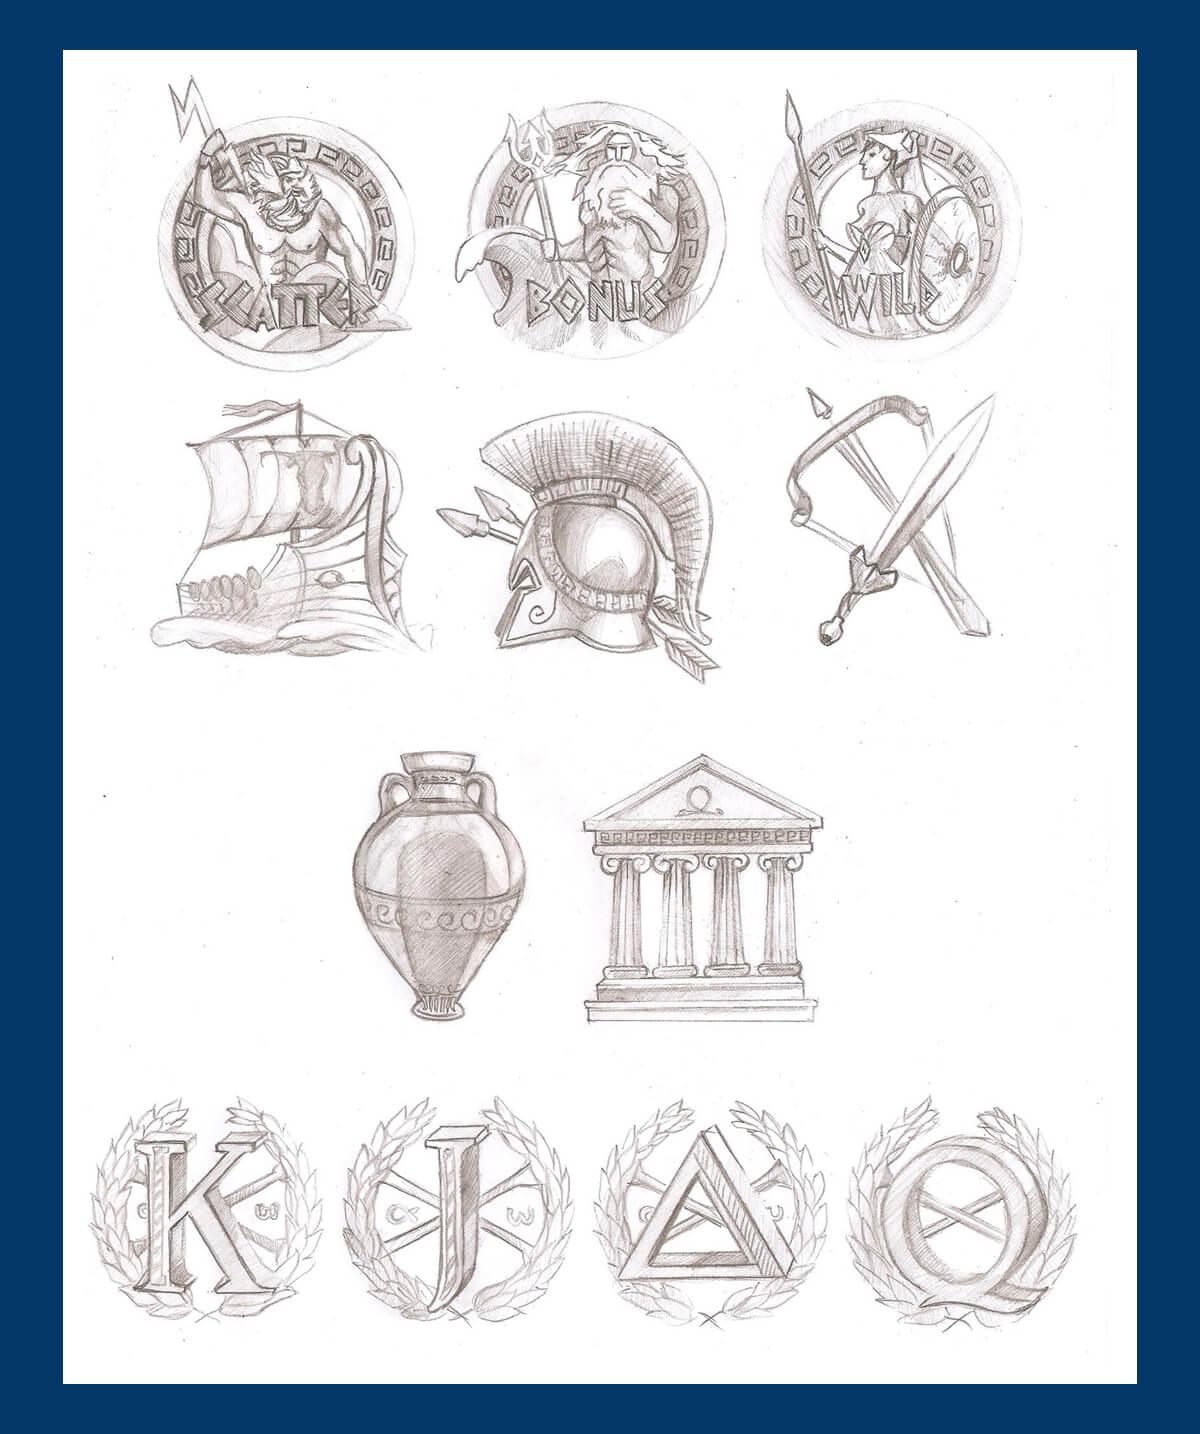 Game slot machine gods of olympus slotopaint game symbols biocorpaavc Images